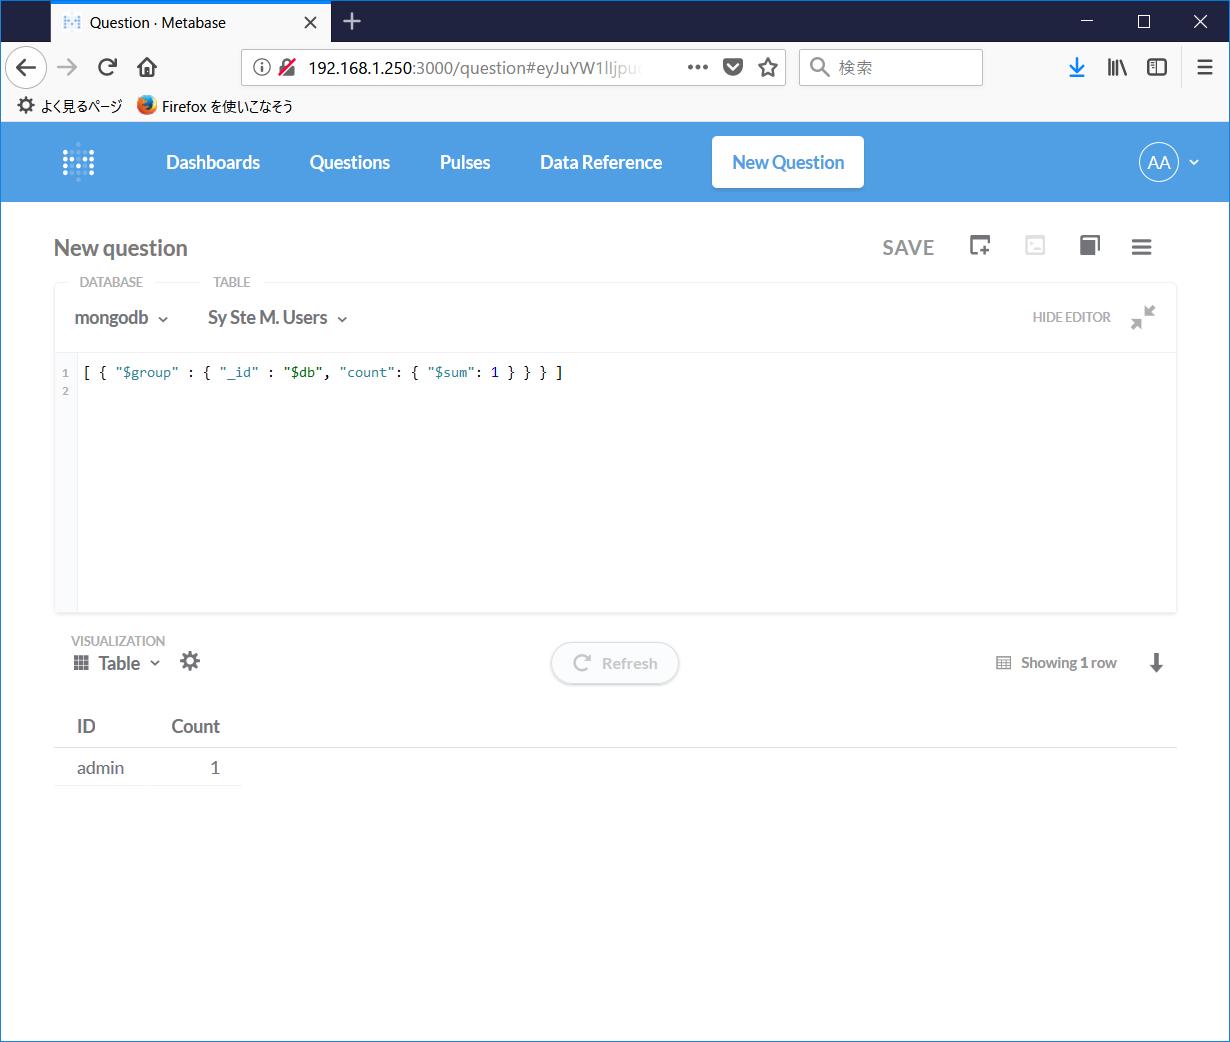 serverあれこれ: DockerでMetabase、MongoDB、PostgreSQL10 4を